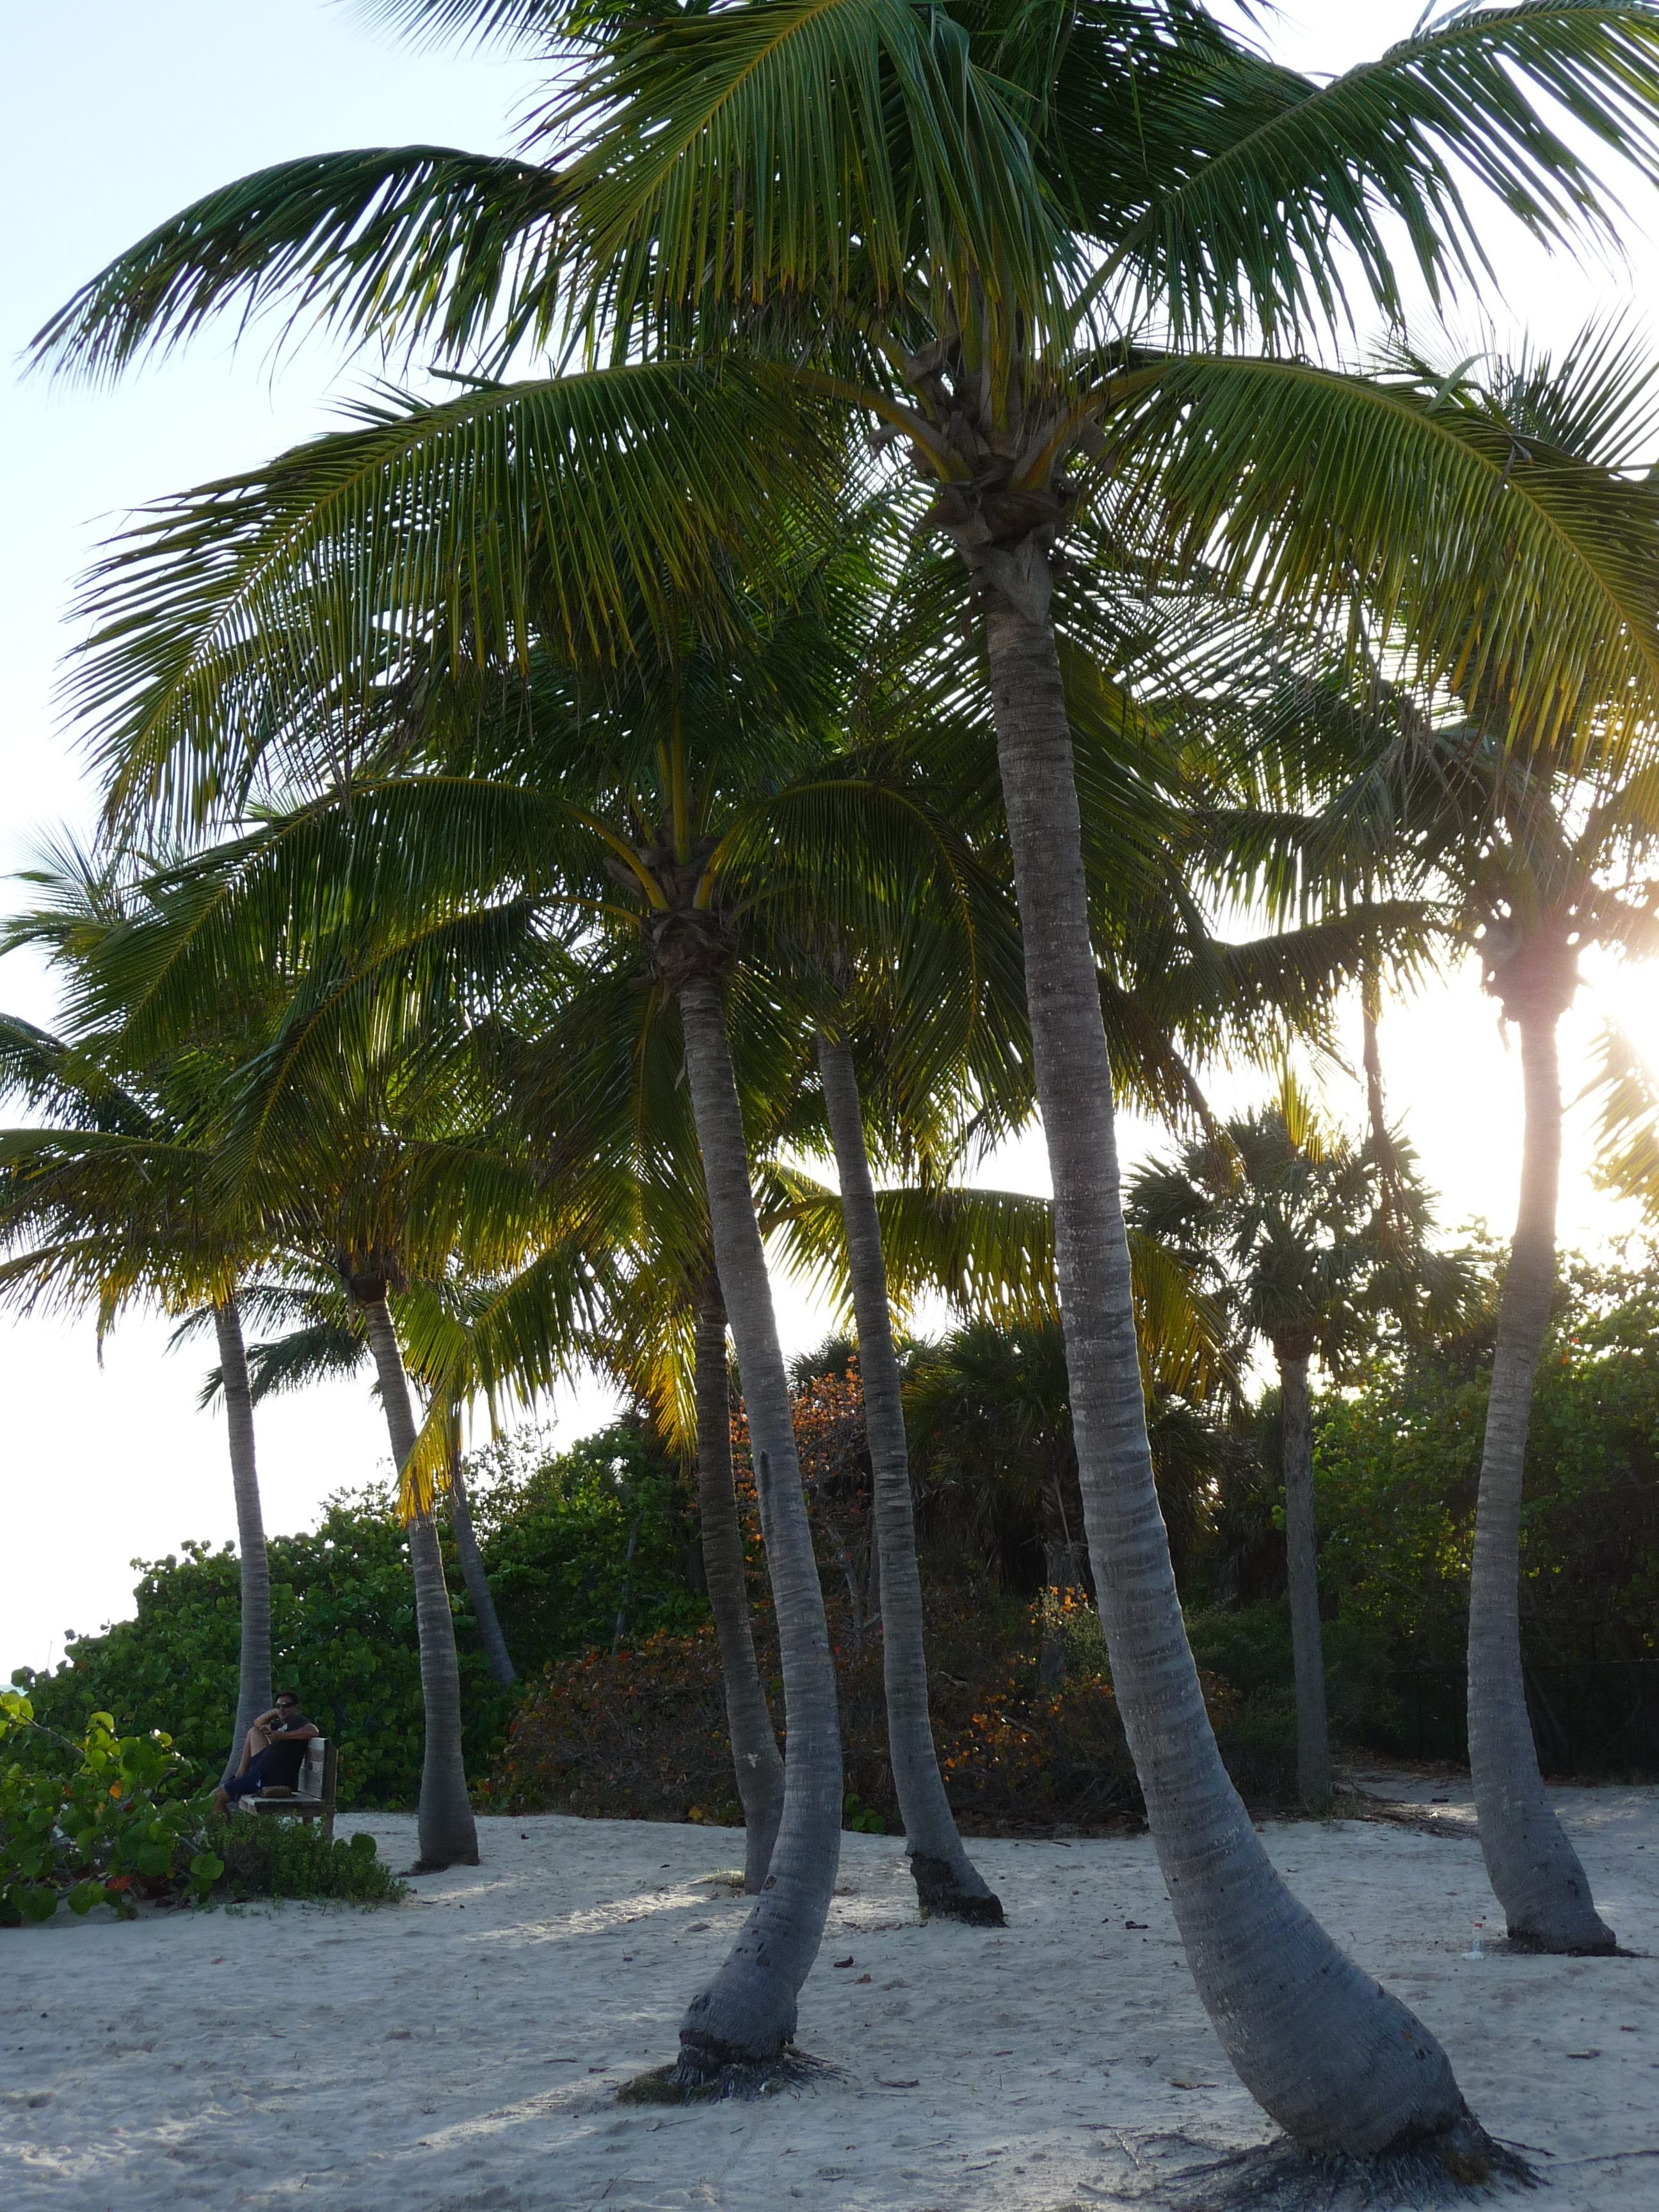 palmiers plage key biscayne